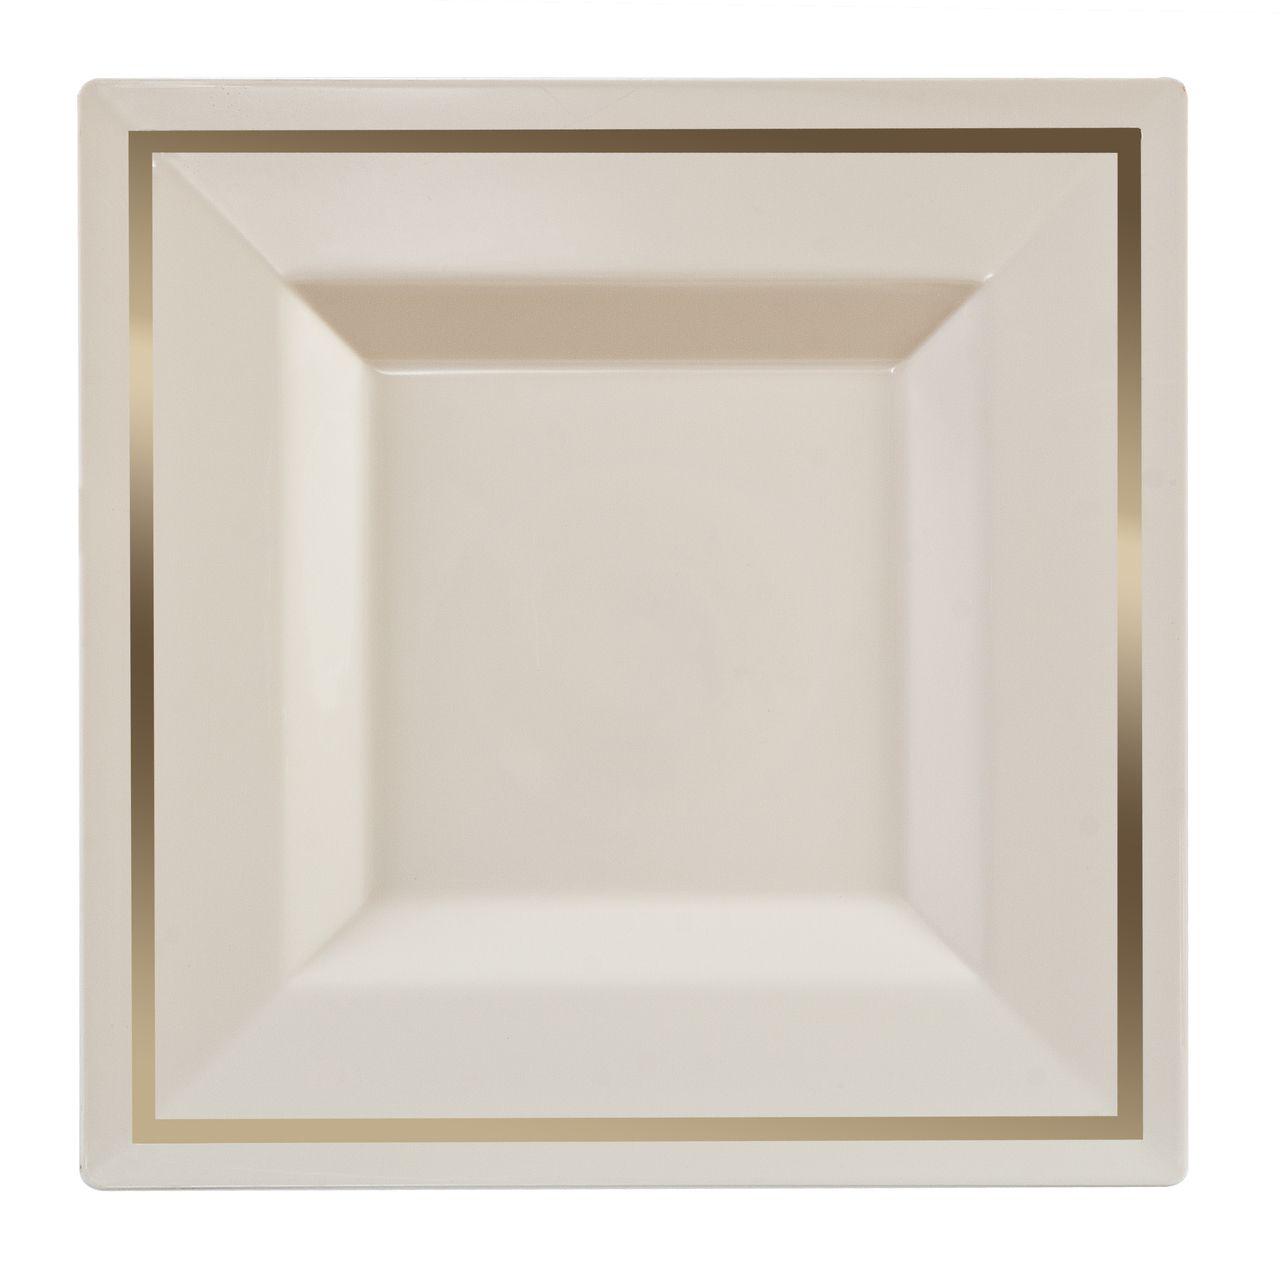 6.5  Square Ivory / Gold Bari Plastic Dessert Plates  sc 1 st  Pinterest & 6.5